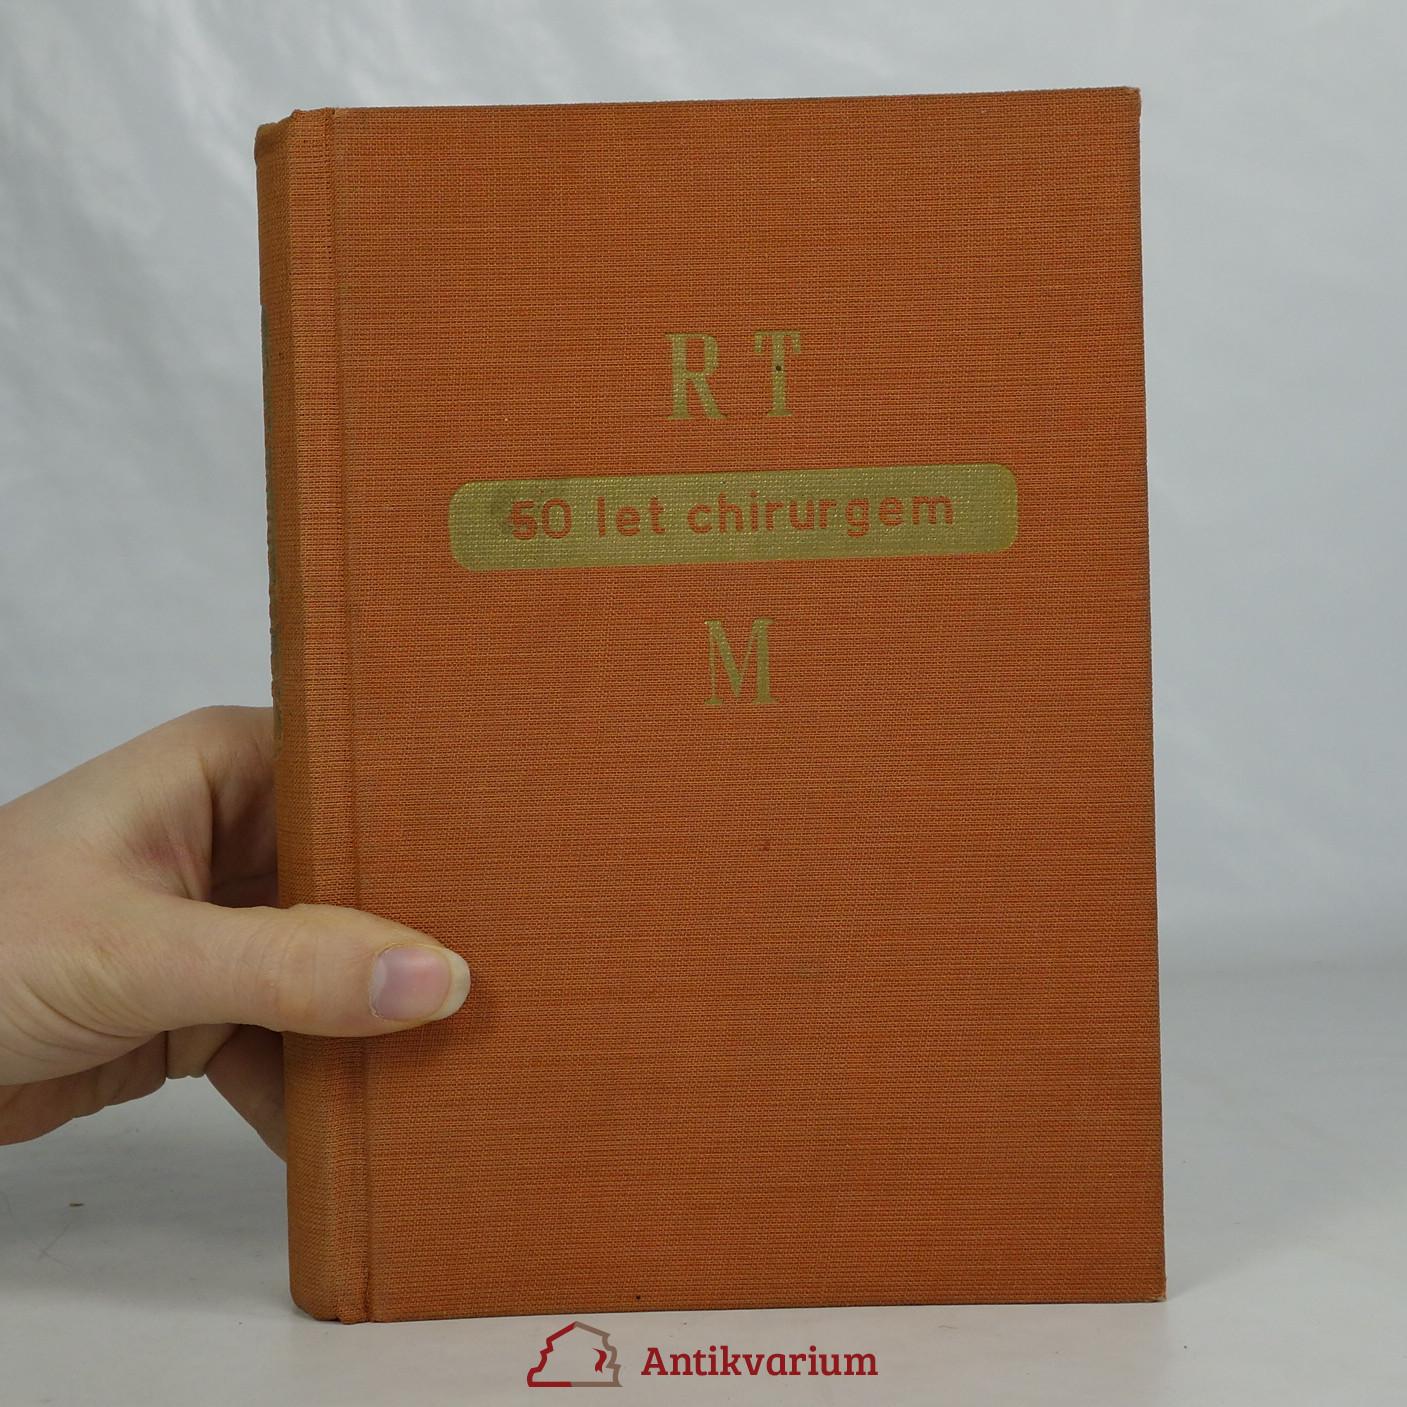 antikvární kniha Padesát let chirurgem , 1946